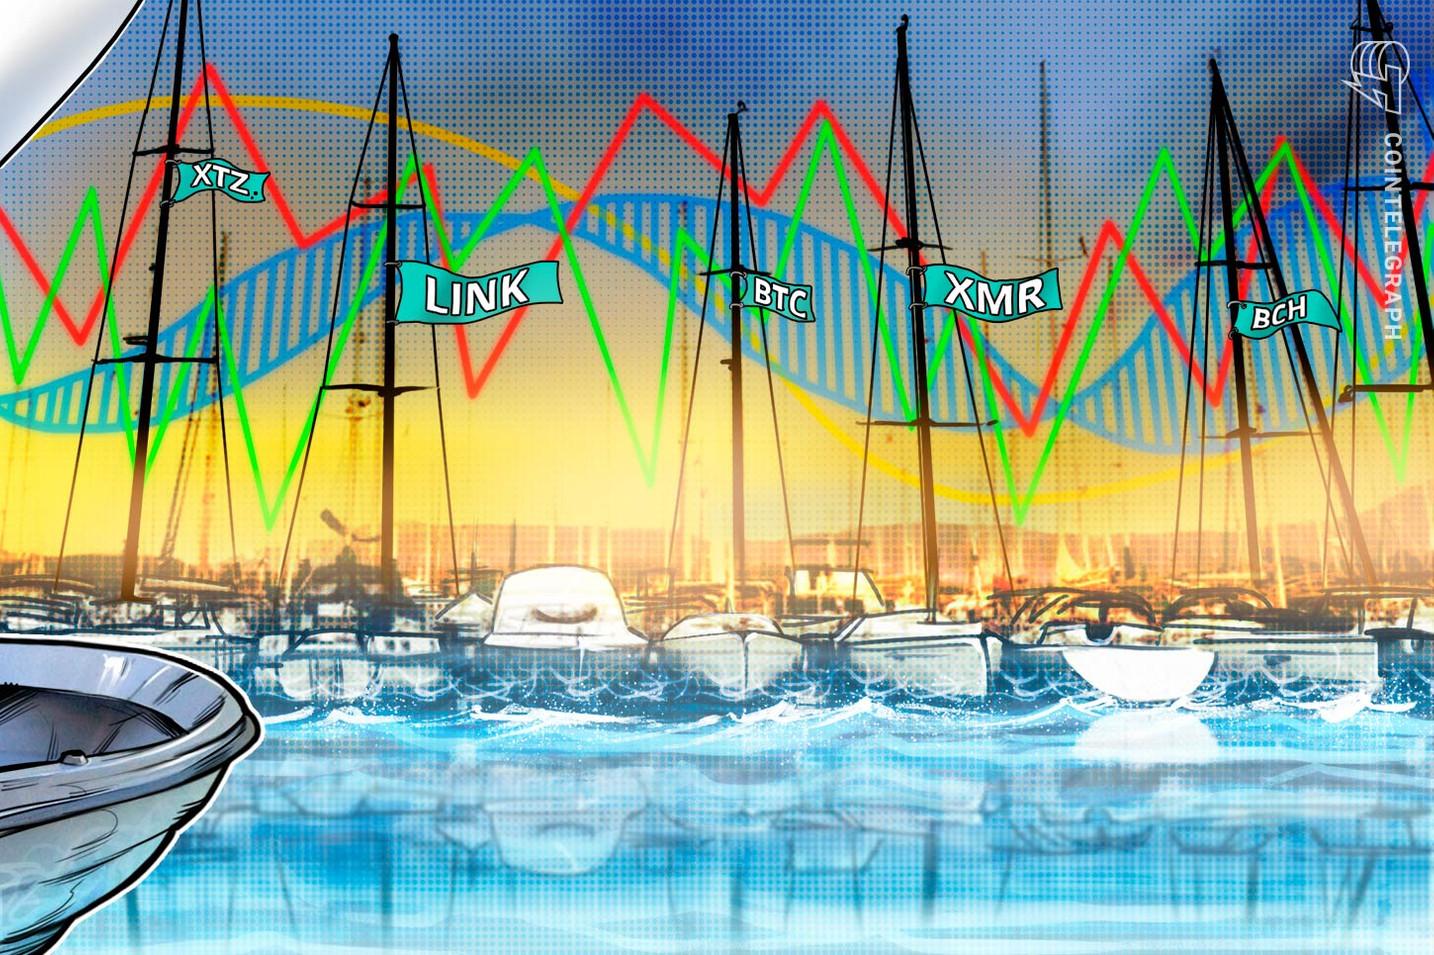 Top-5 Crypto Performers: XTZ, LINK, BTC, BCH, XMR